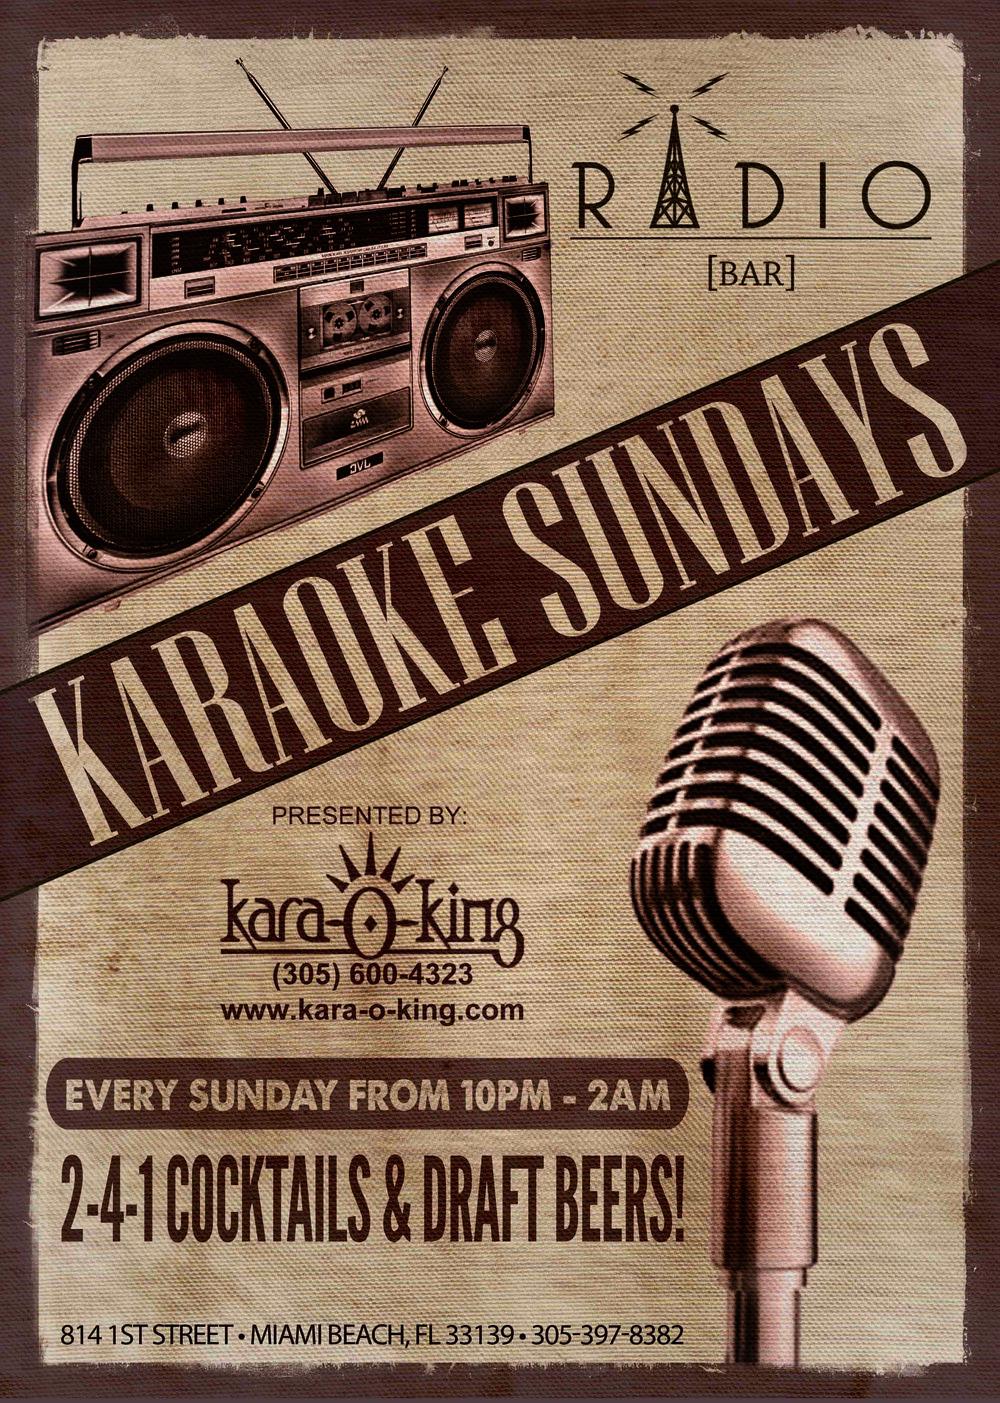 Radio_Bar_Karaoke_Sundays